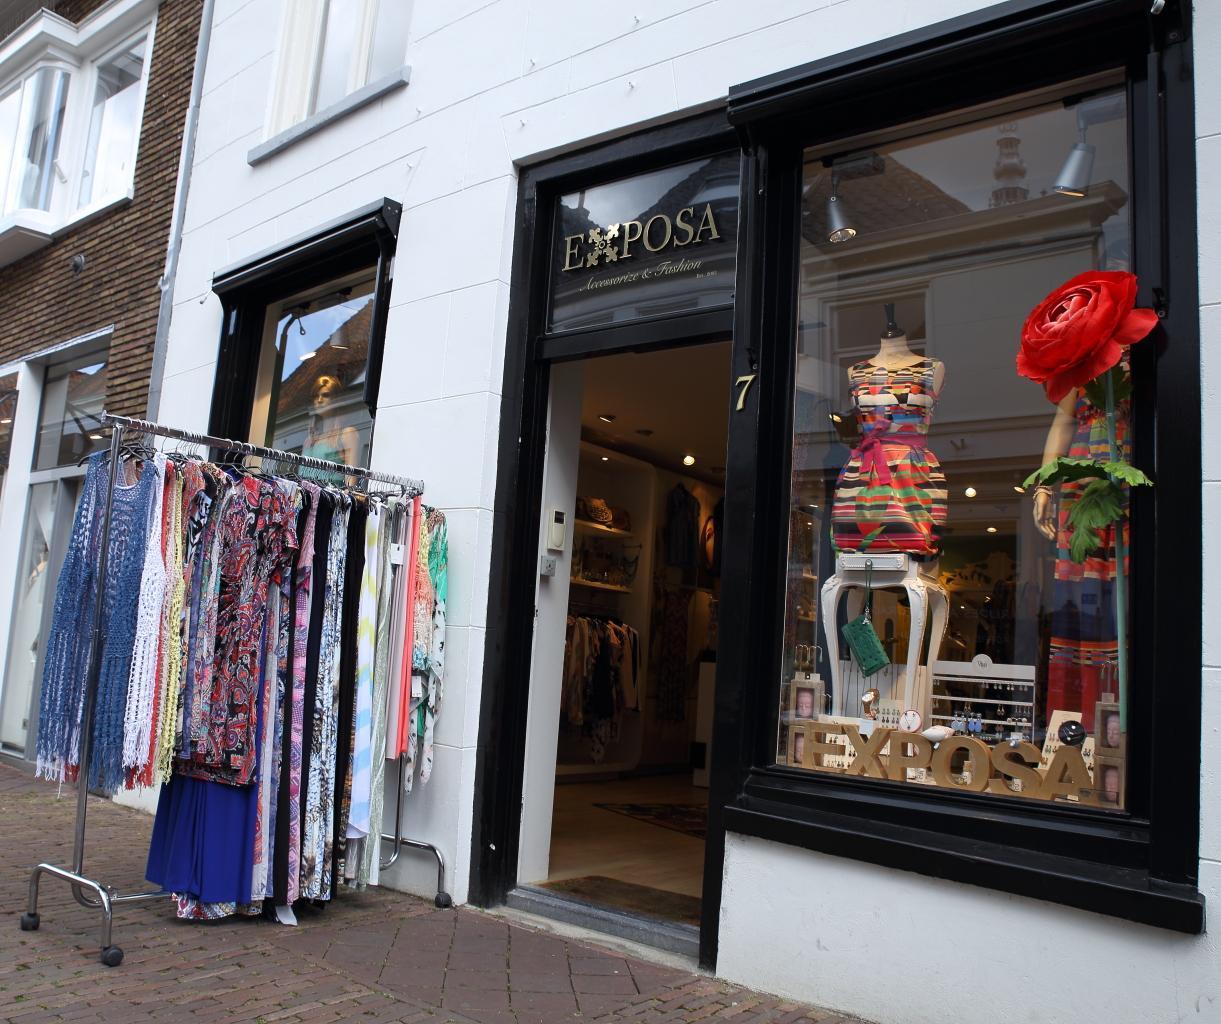 25c7369d62c Exposa in Amersfoort Winkelen Gezellig shoppen modezaak kleding tassen  sieraden - foto 1